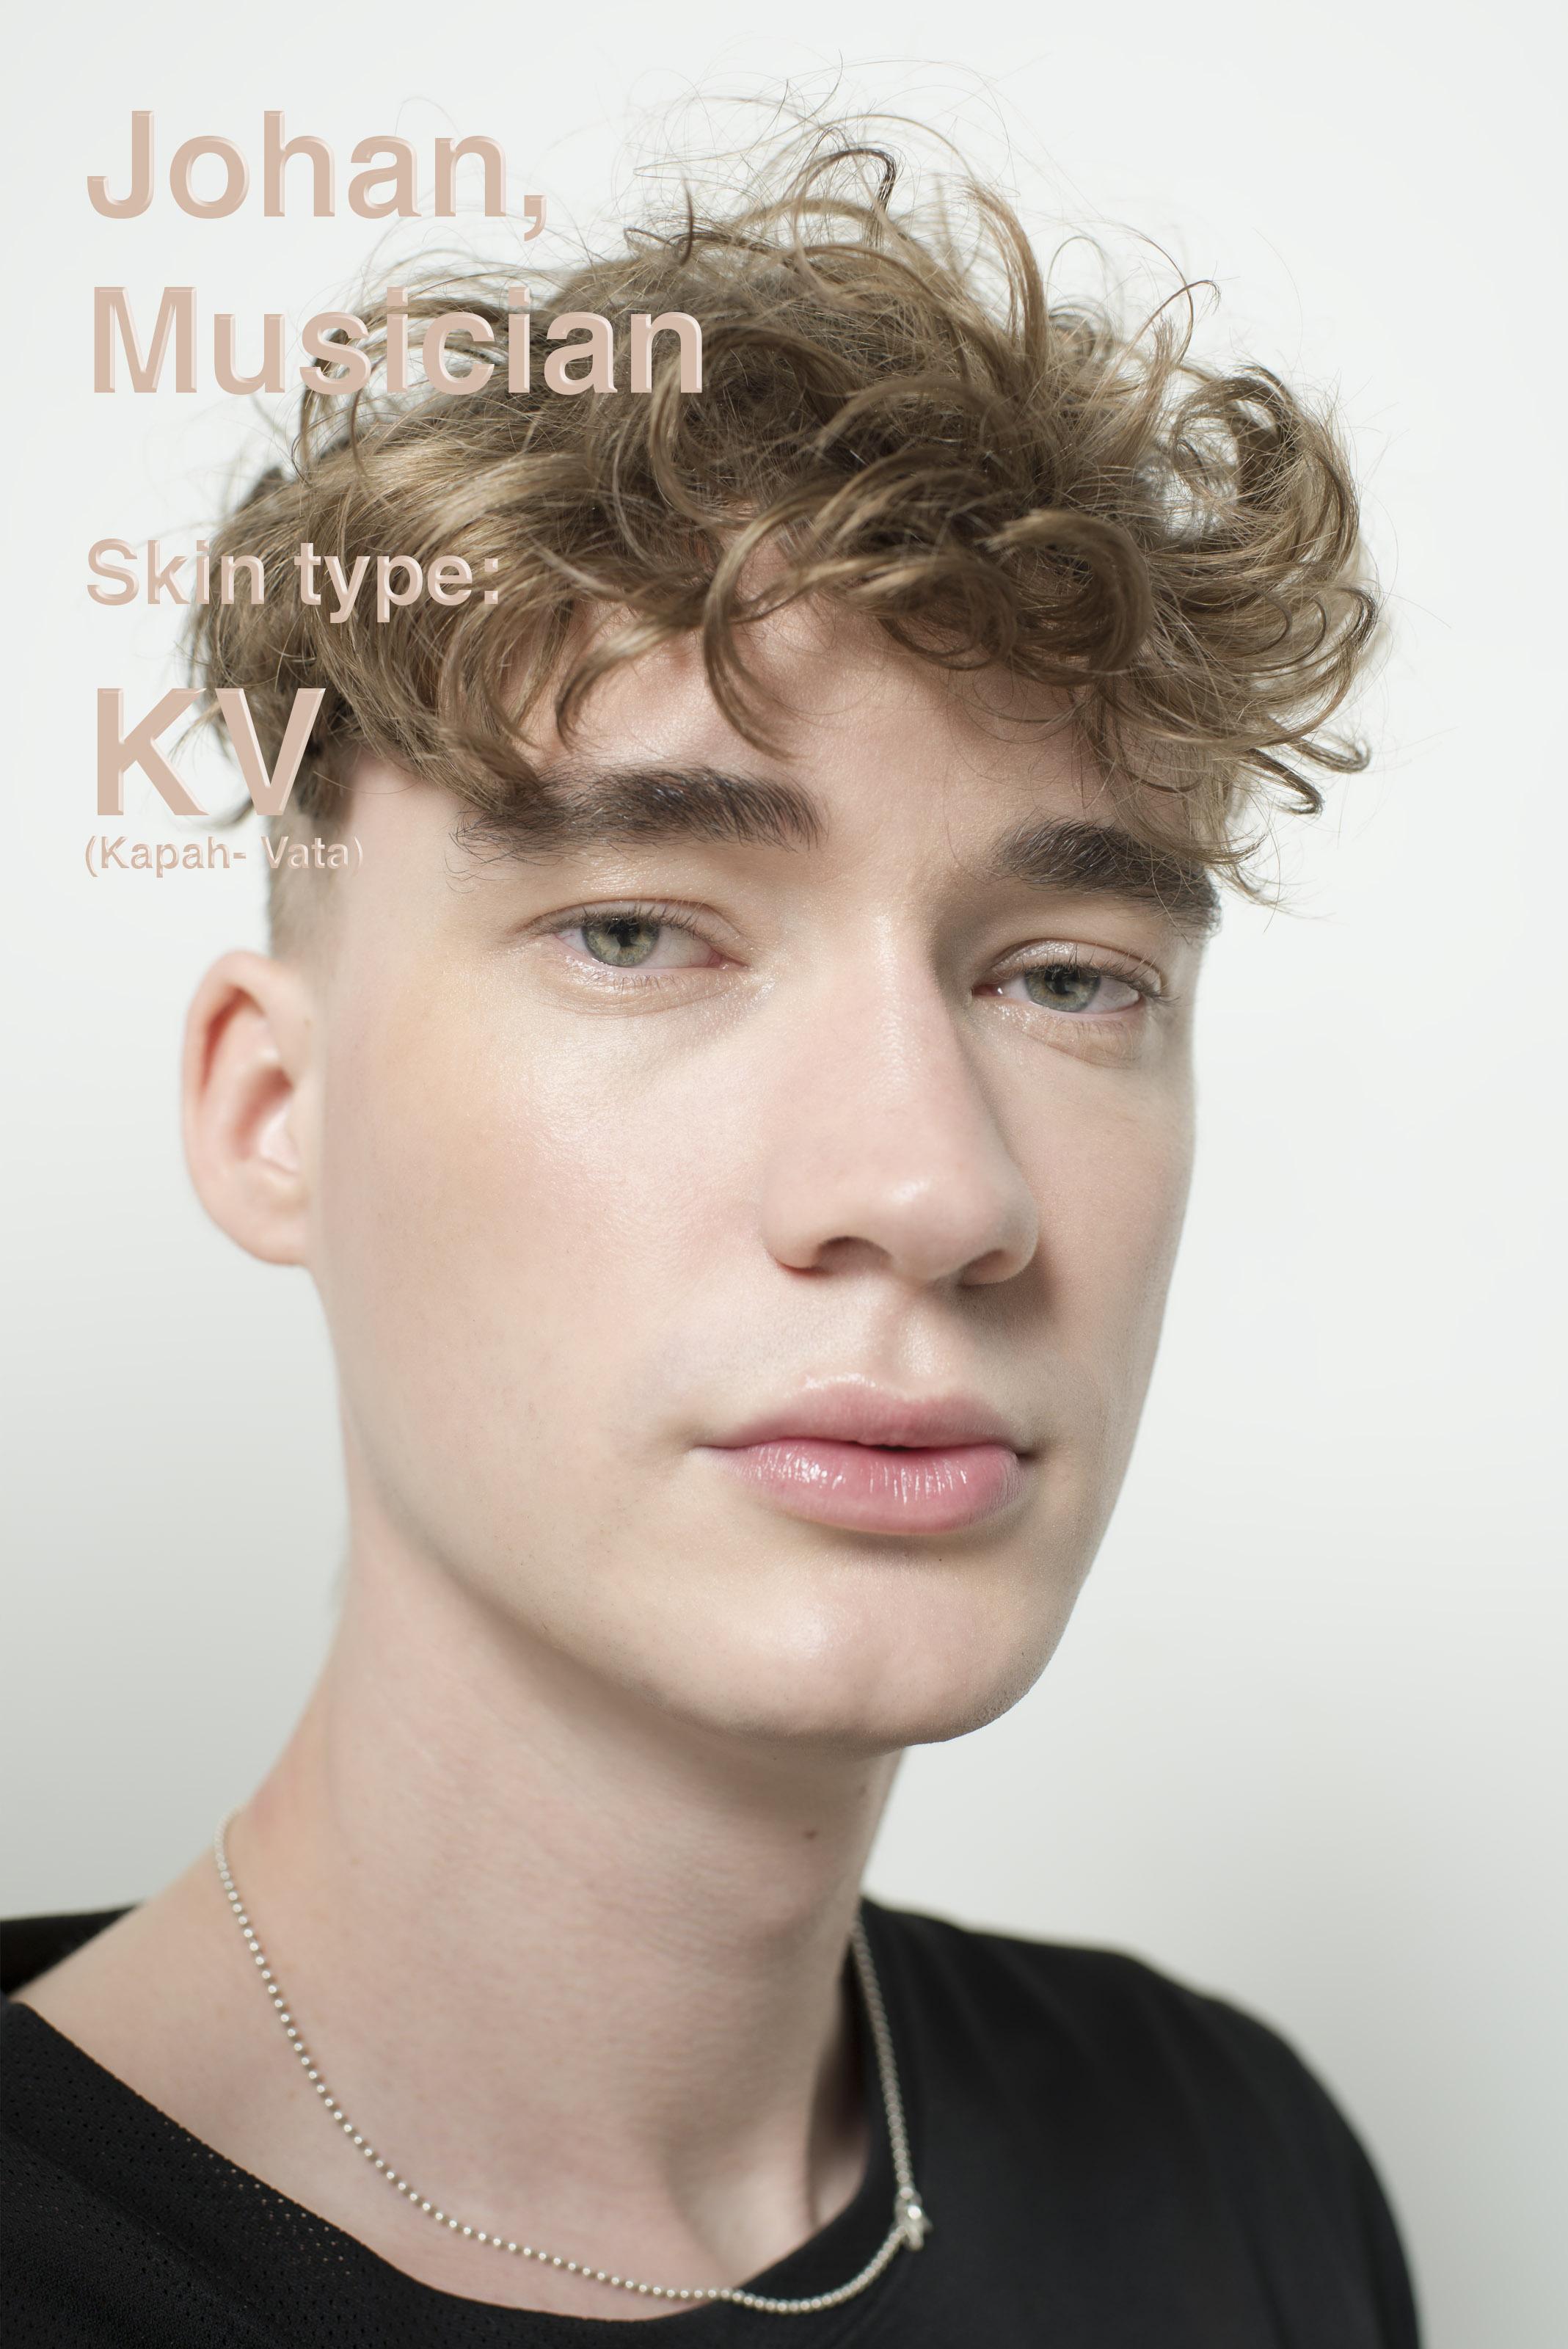 johan skin type